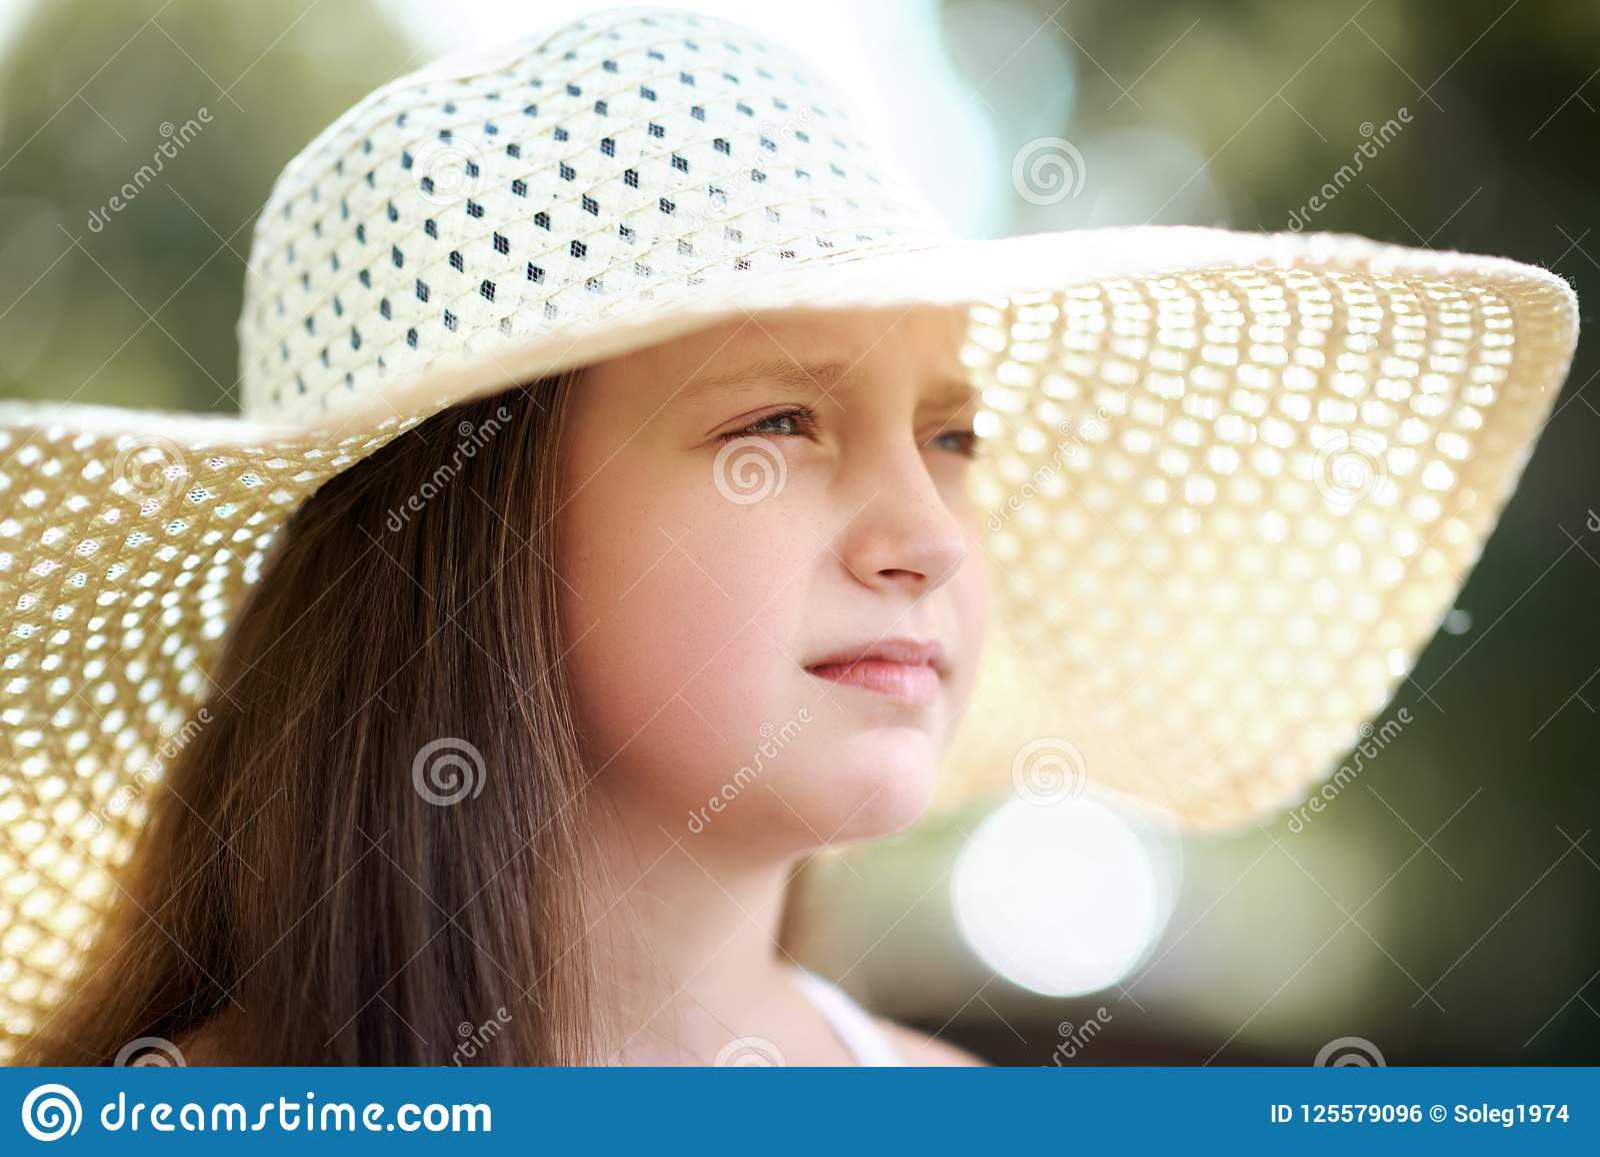 4eb29ec67 Portrait Of A Little Girl Wearing A Big Hat